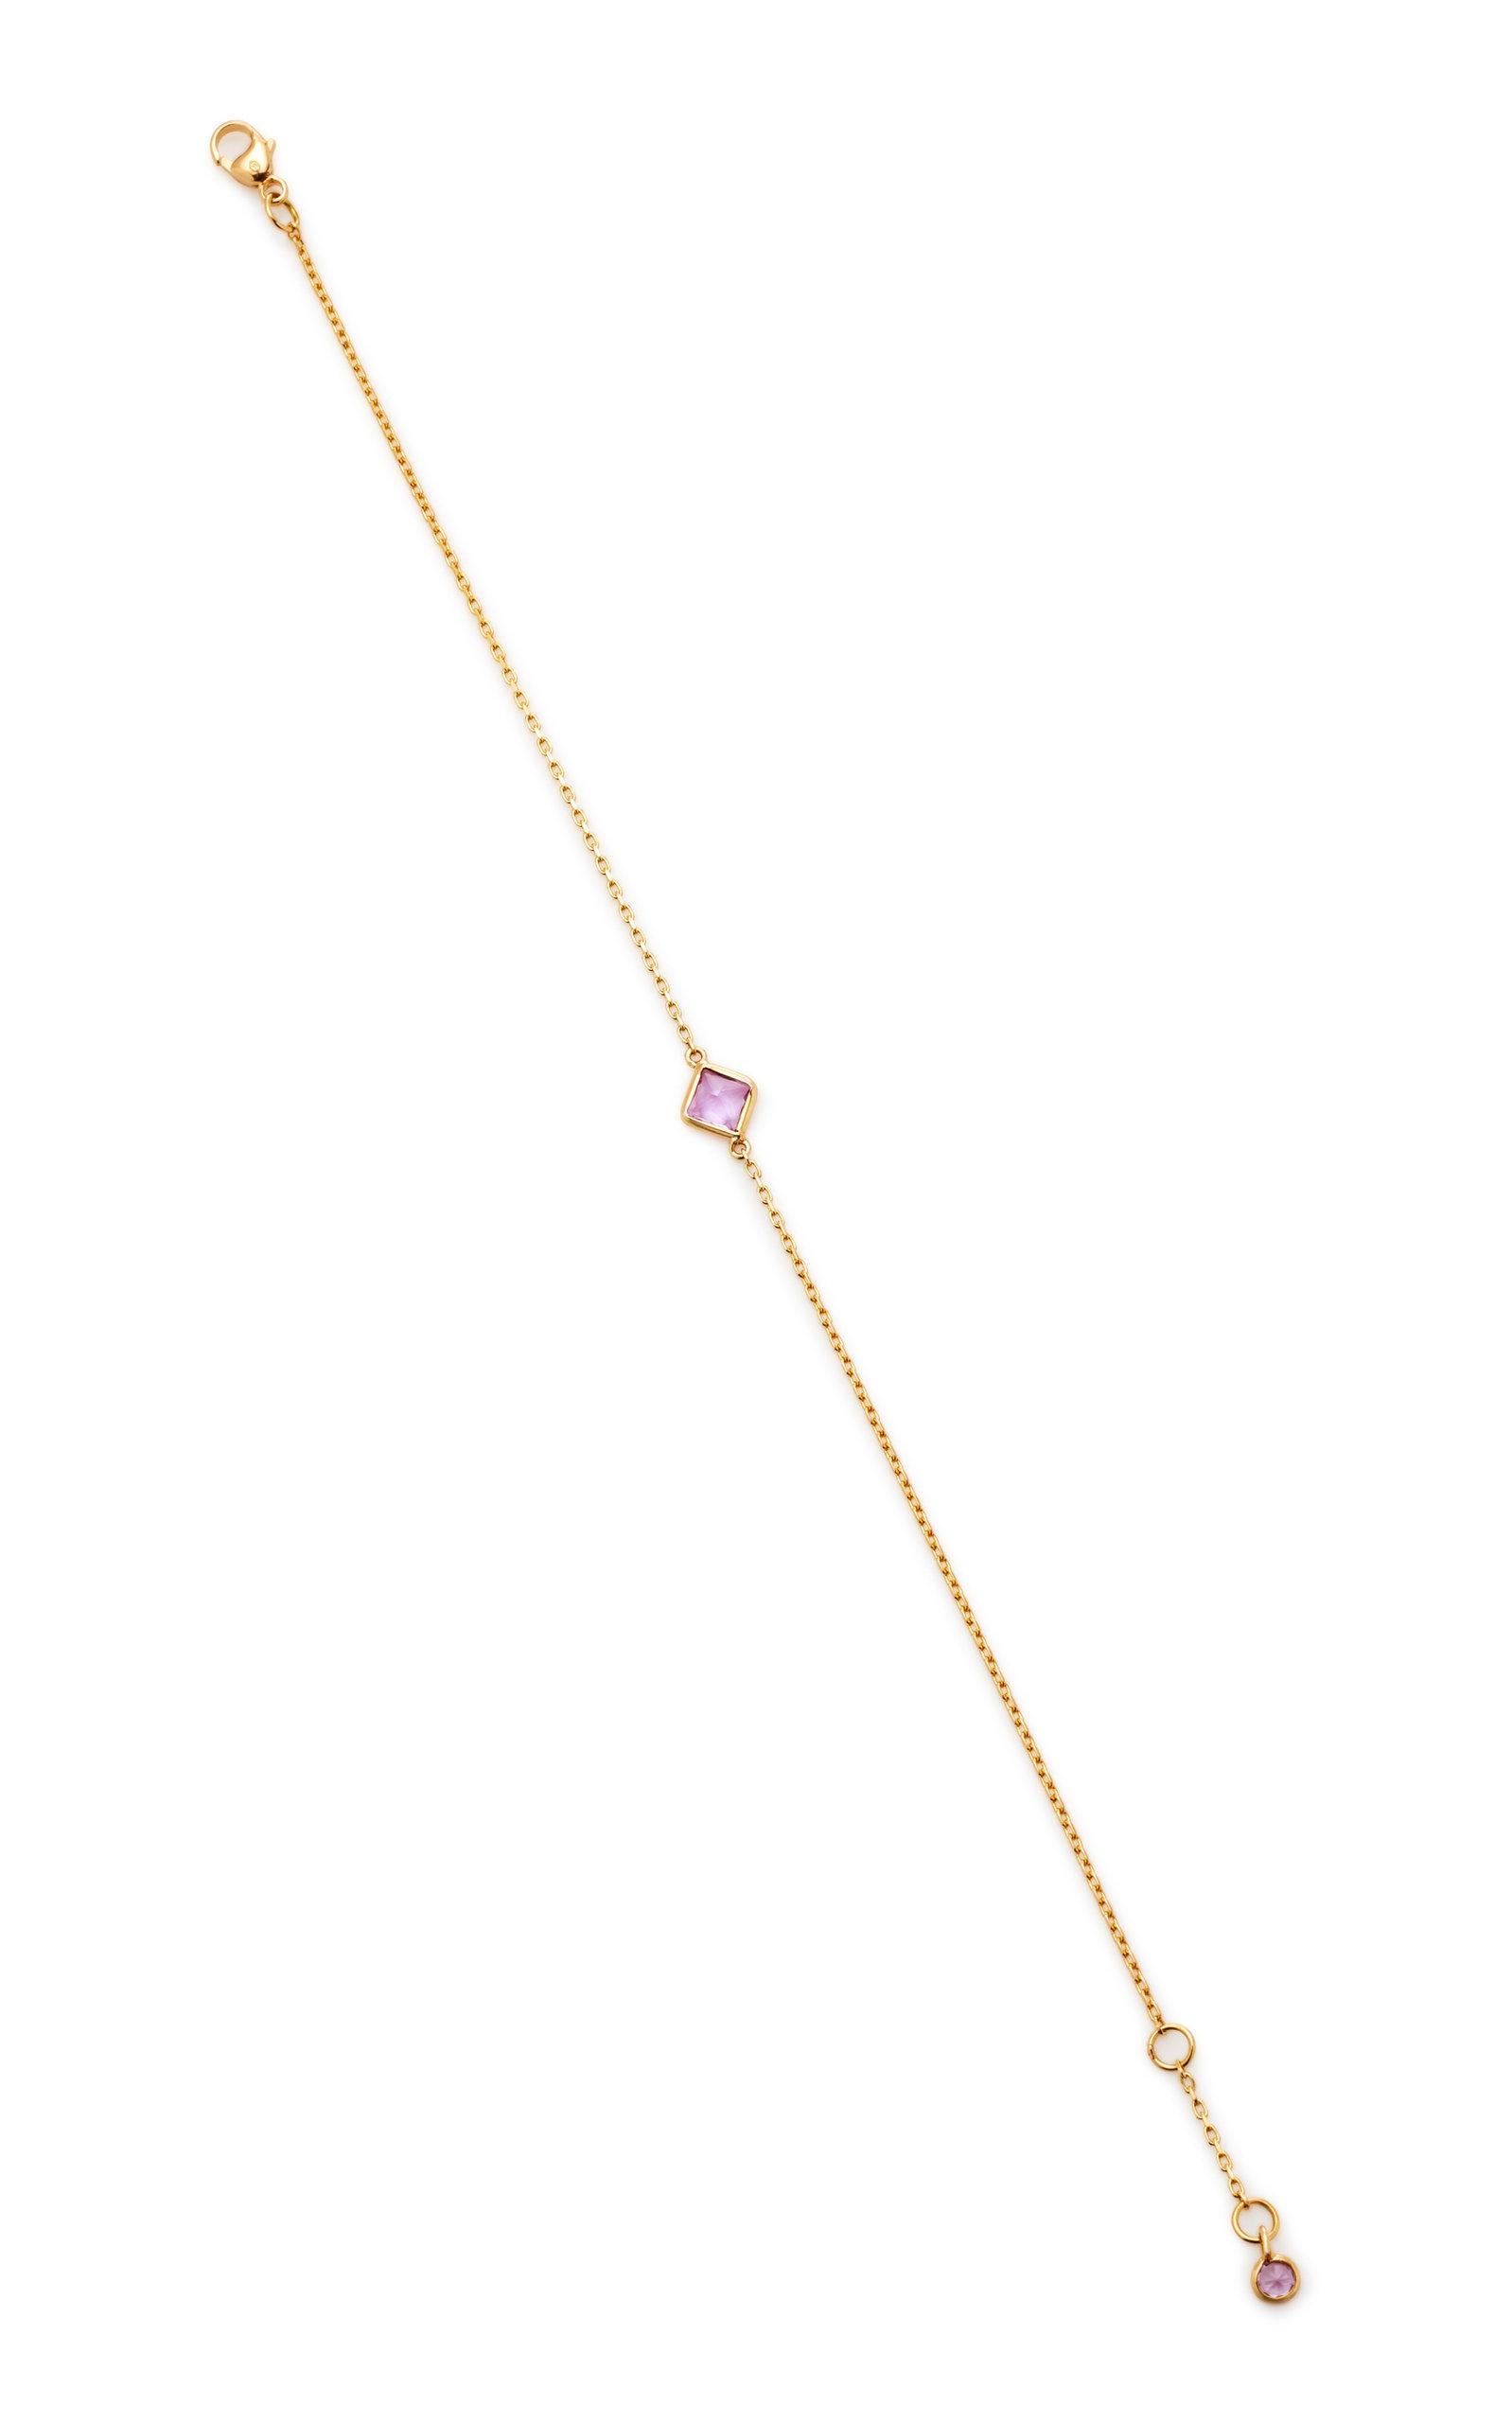 YI COLLECTION 18K GOLD PINK SAPPHIRE BRACELET